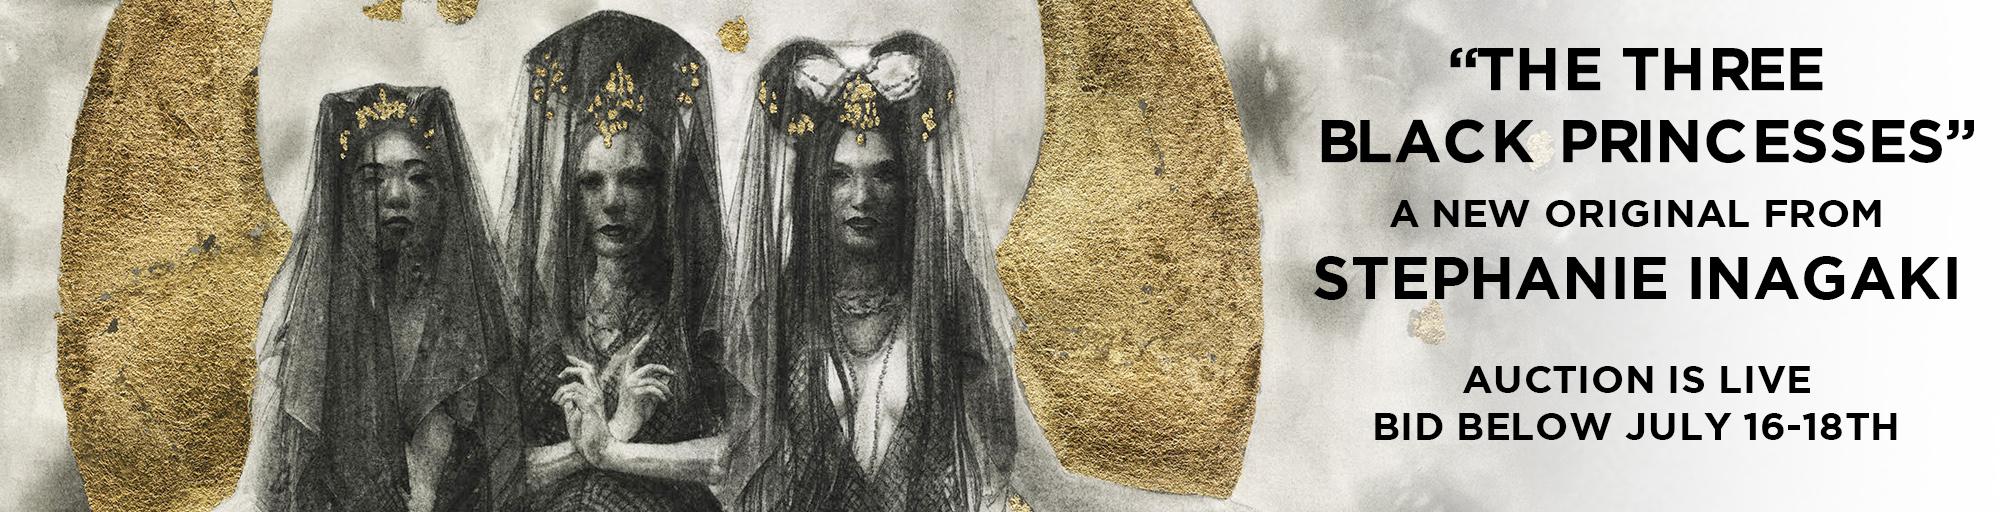 The Three Black Princesses, an original mixed media drawing by Stephanie Inagaki